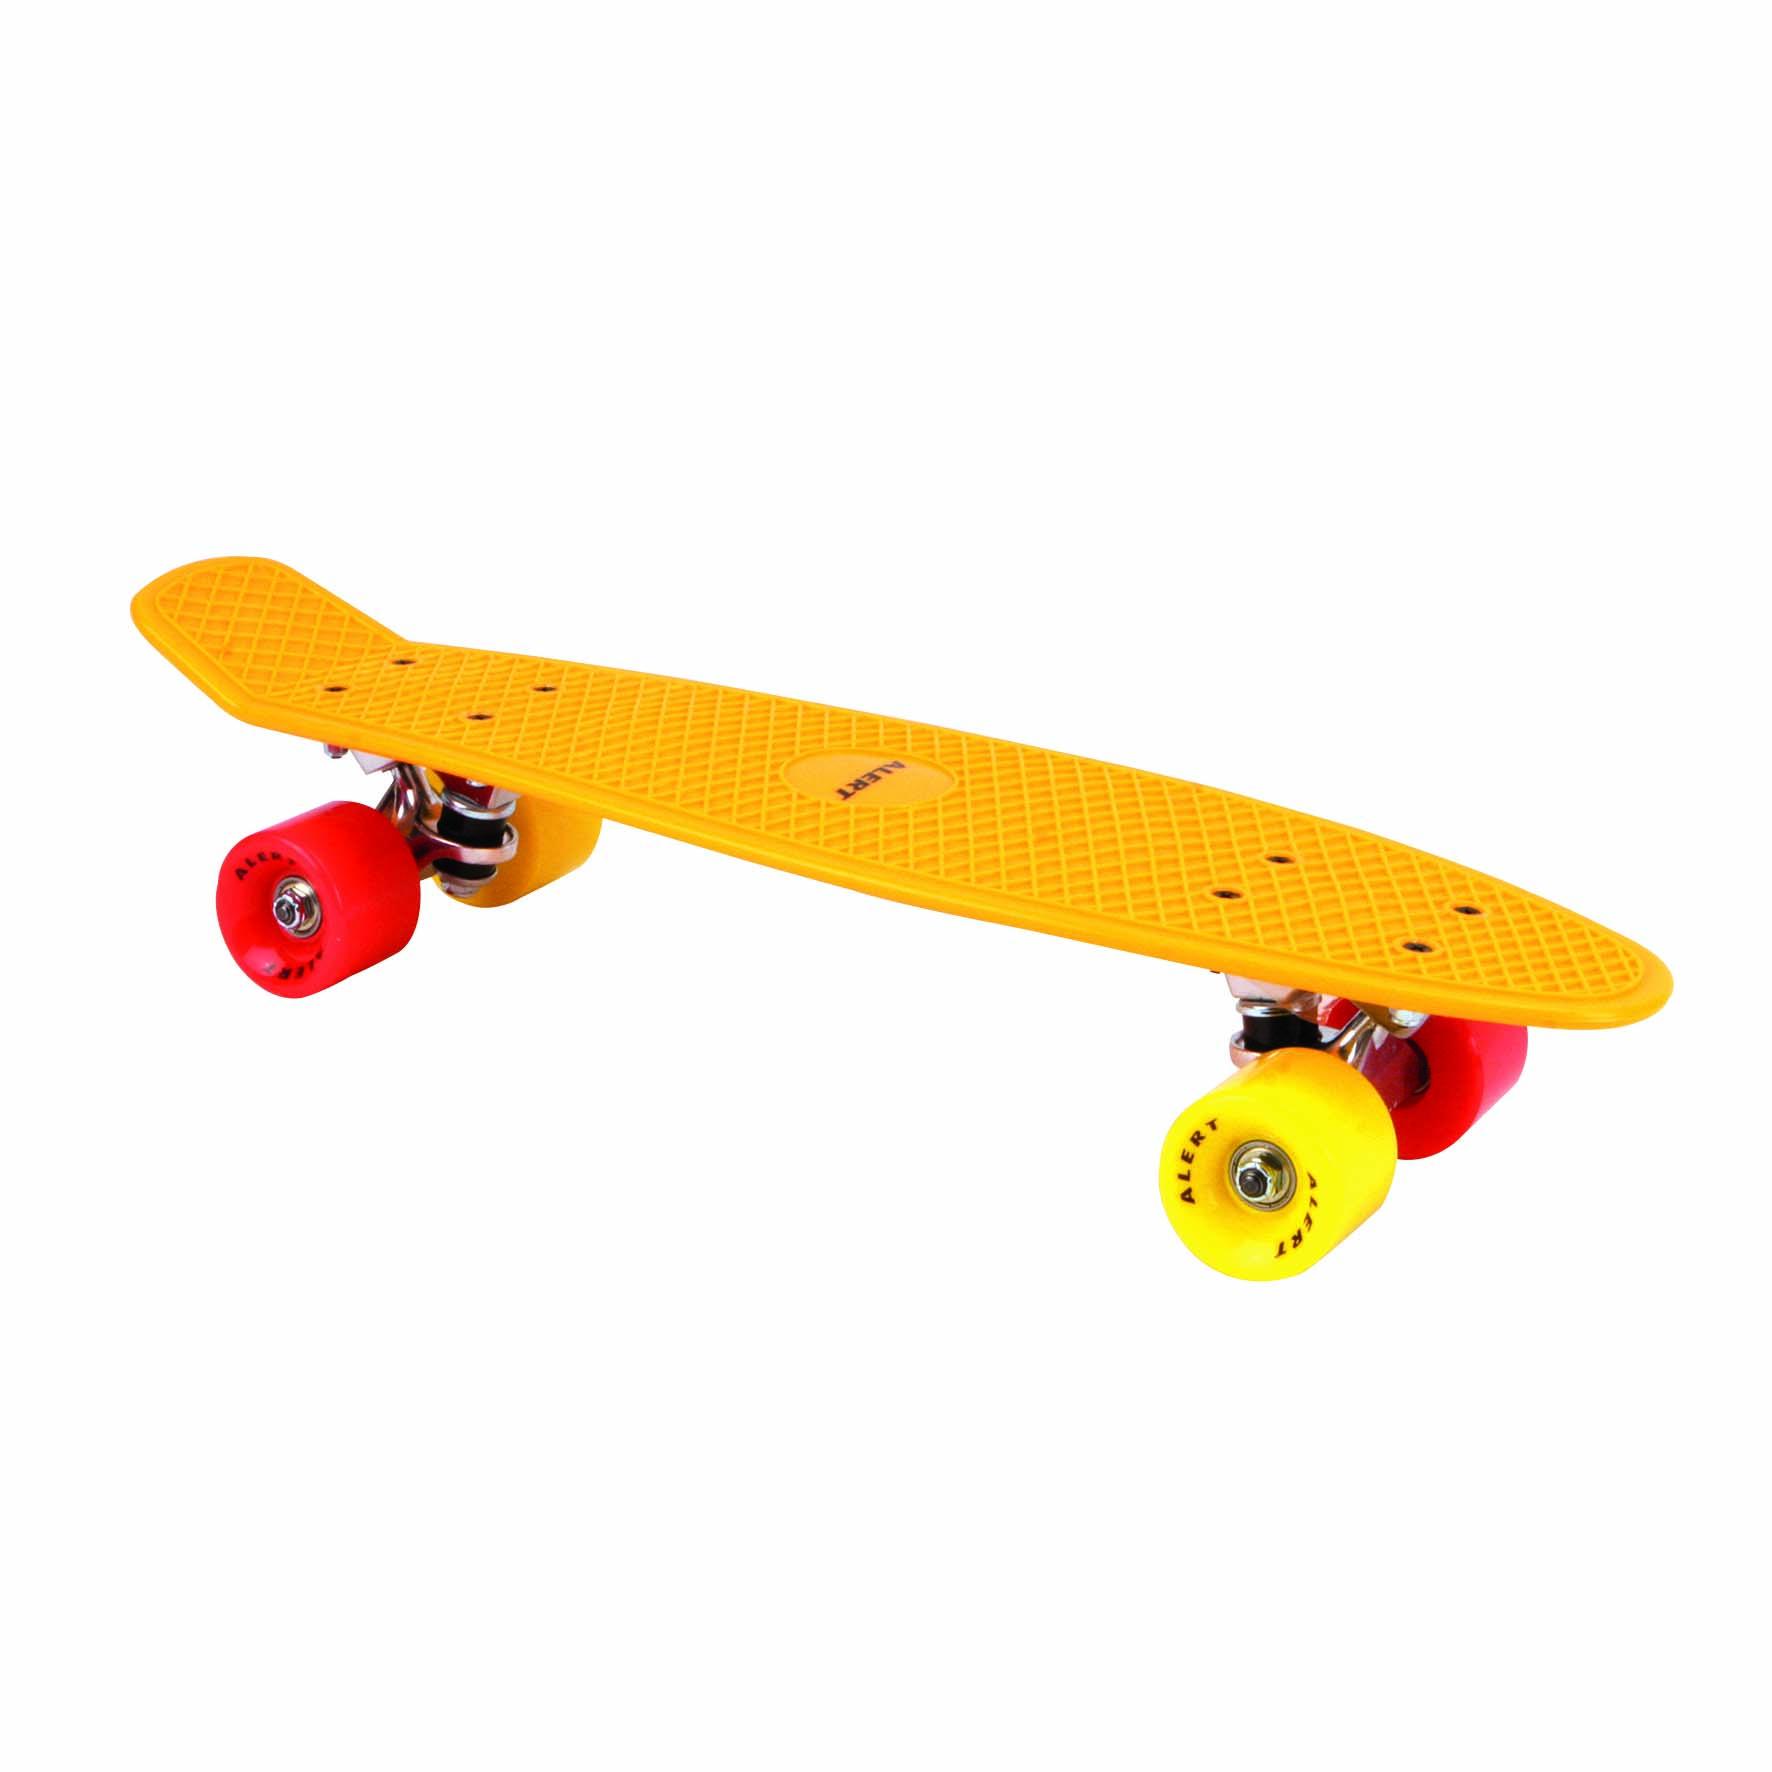 Afbeelding van Skateboard Oranje 55 Cm ABEC 7 Alert